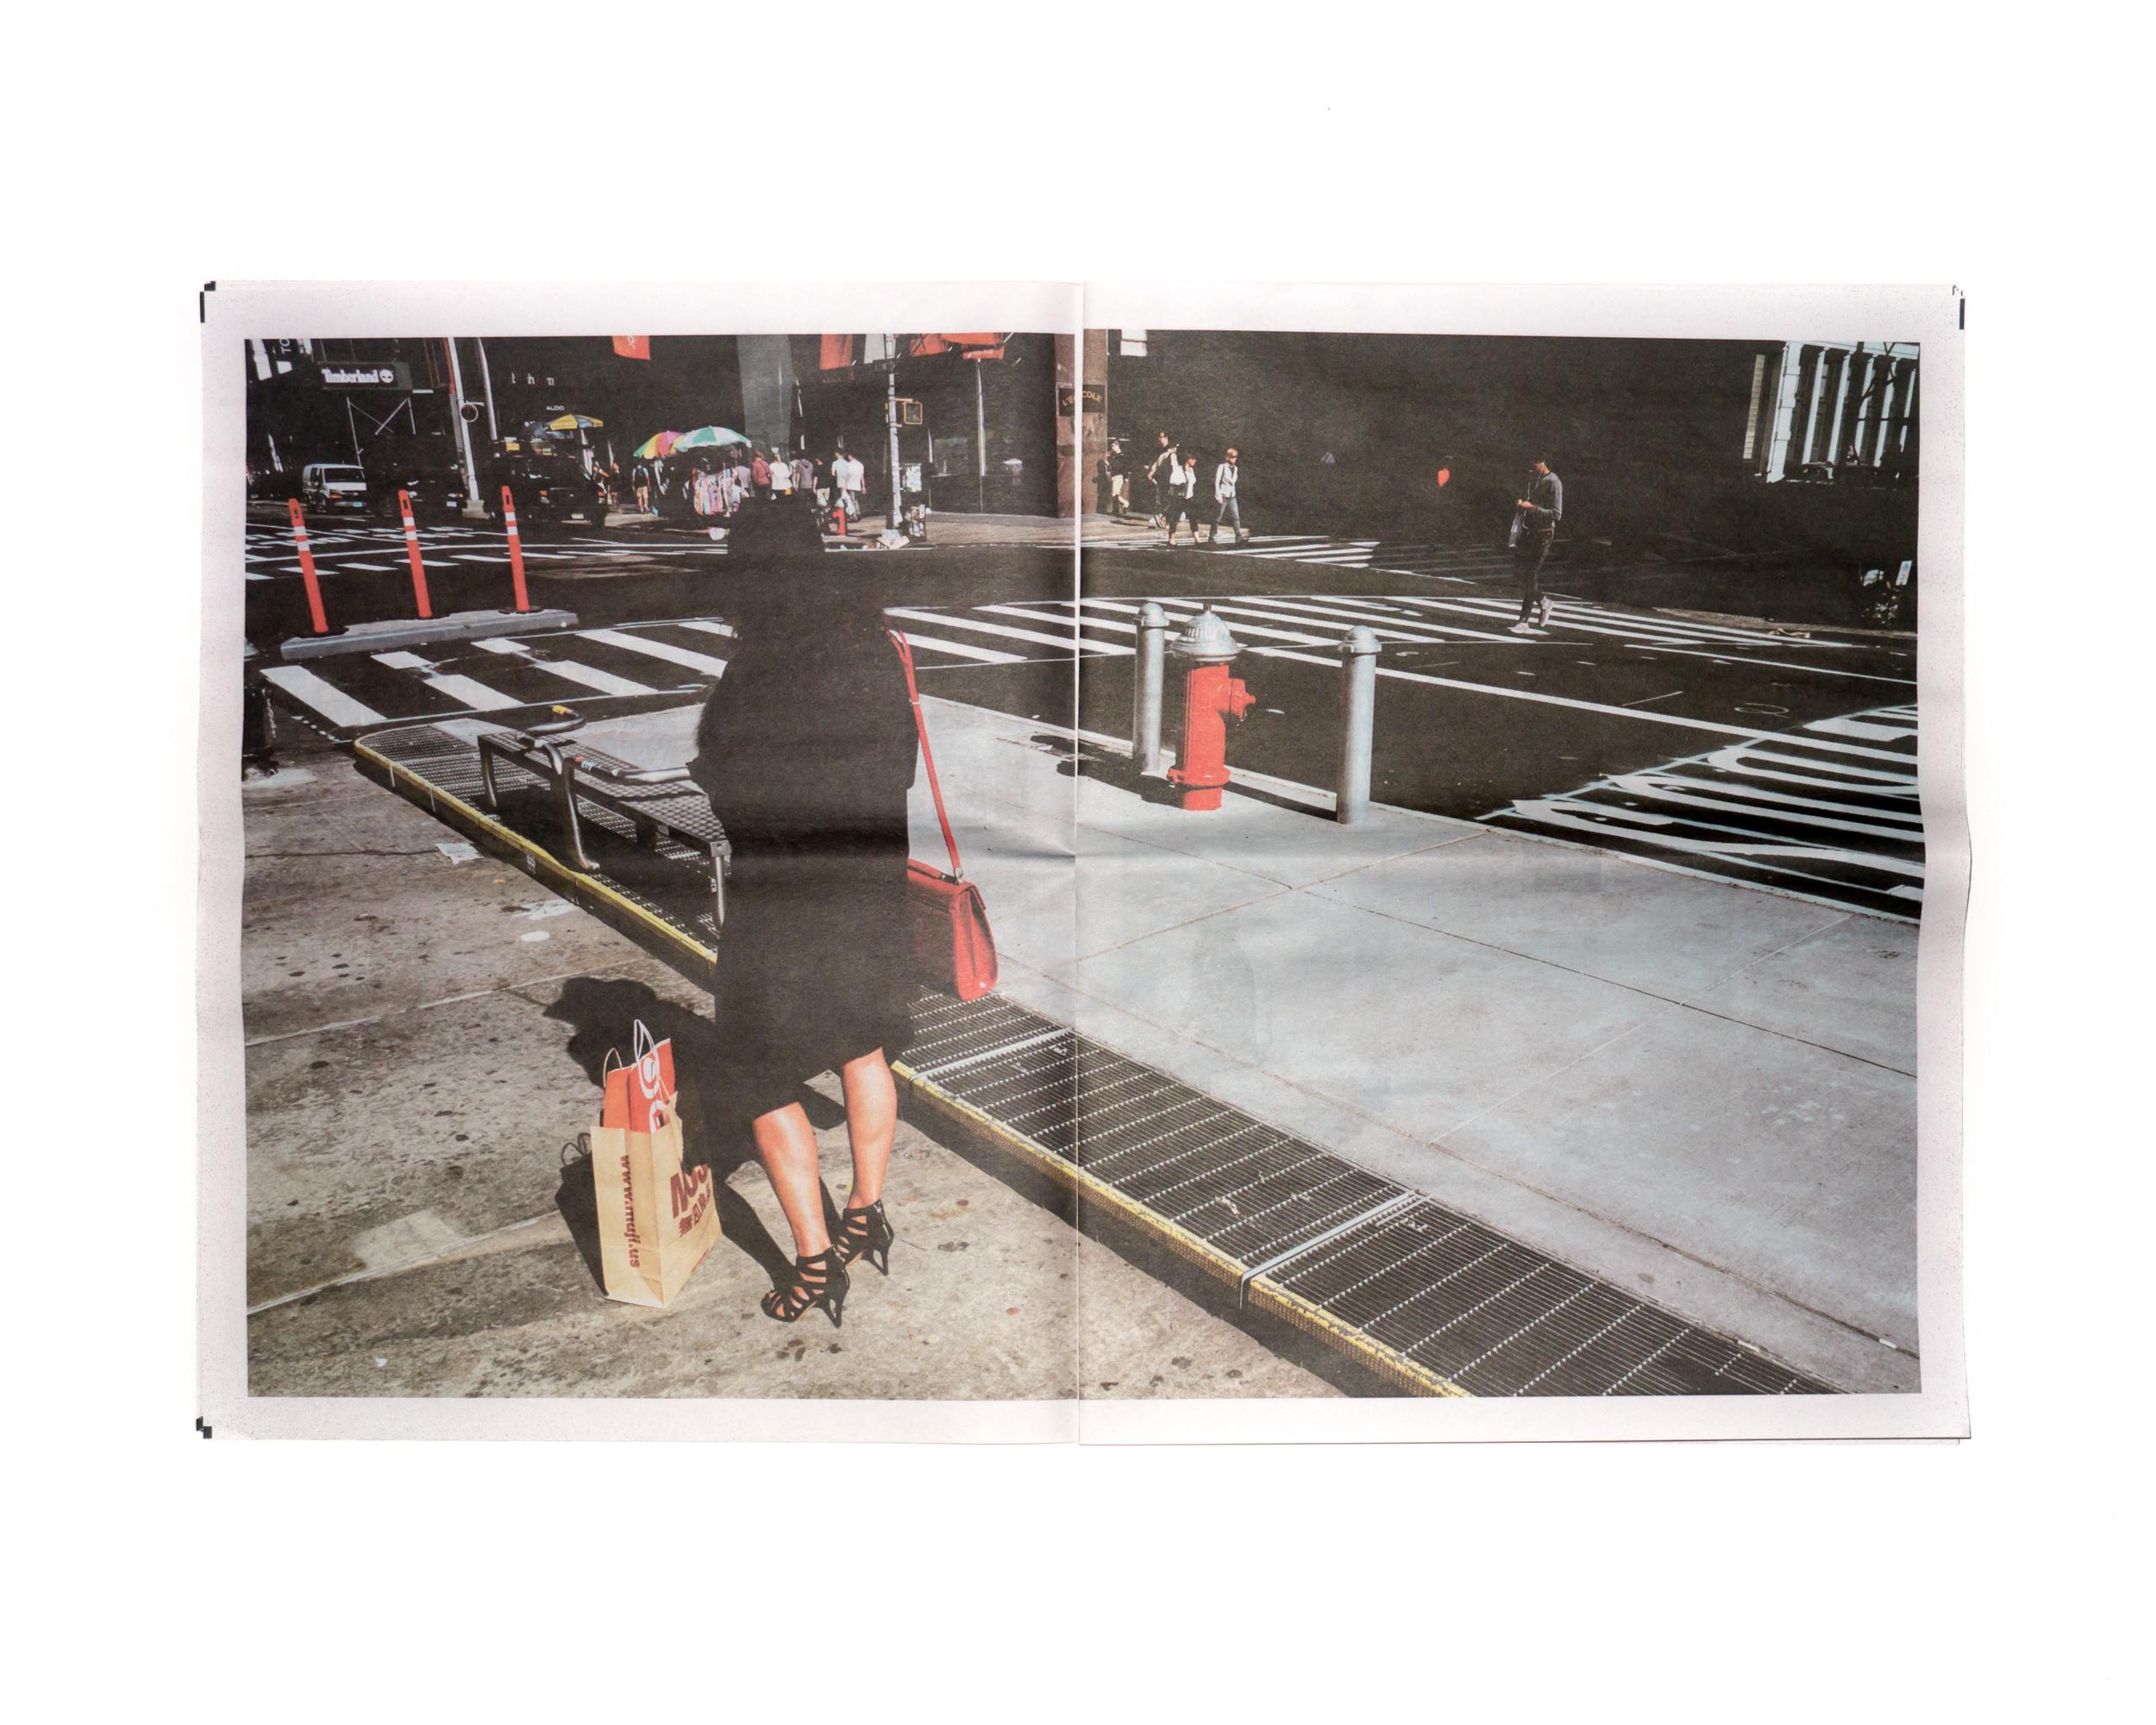 grit-street-01-newsprint-promo-4.jpg